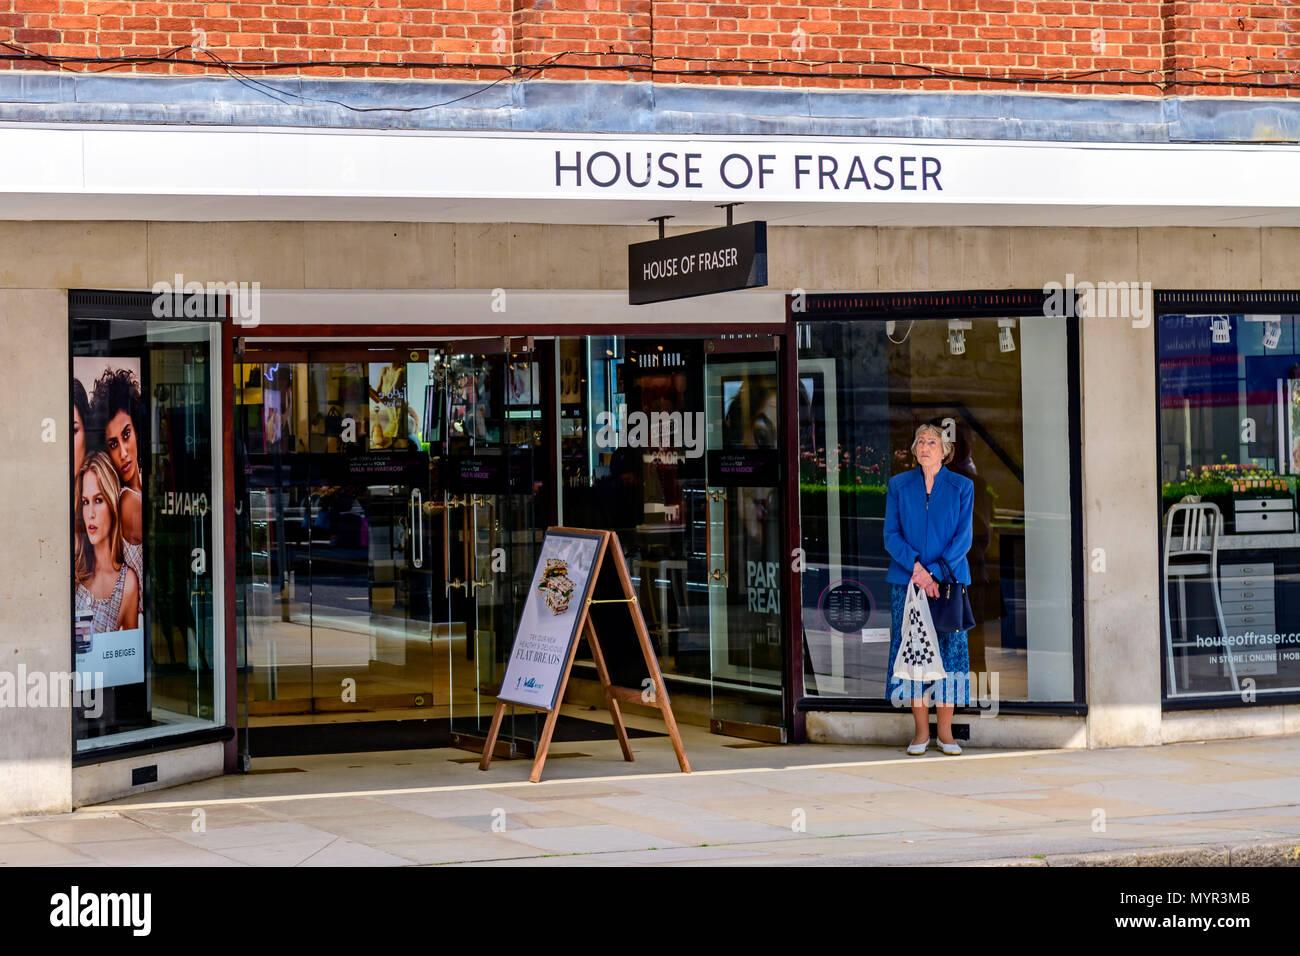 House of Fraser shopfront - Stock Image